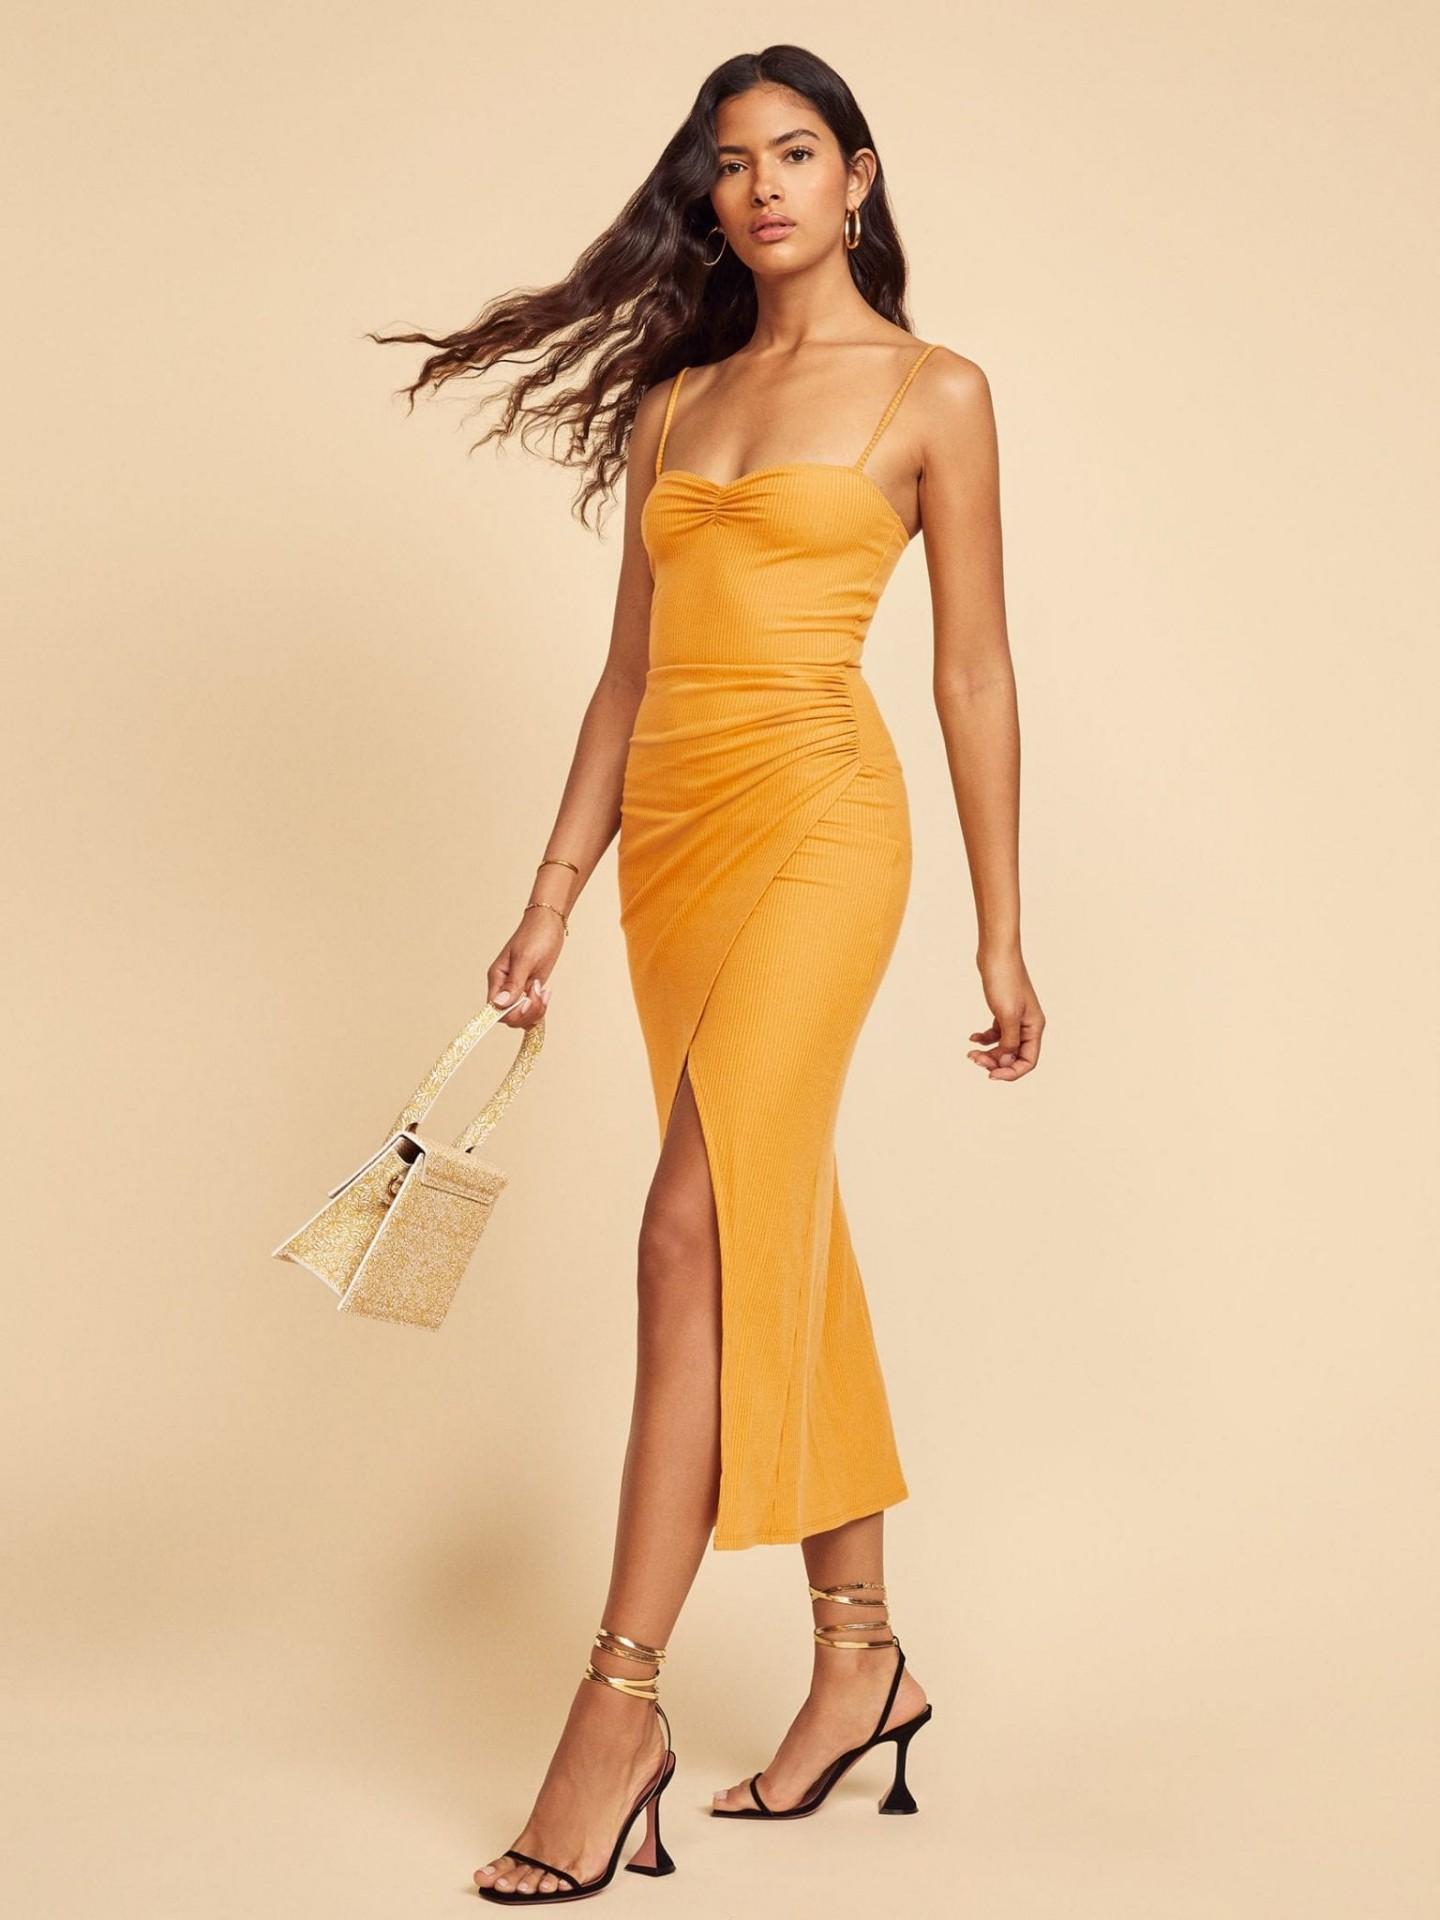 THE REFORMATION Formosa Dress